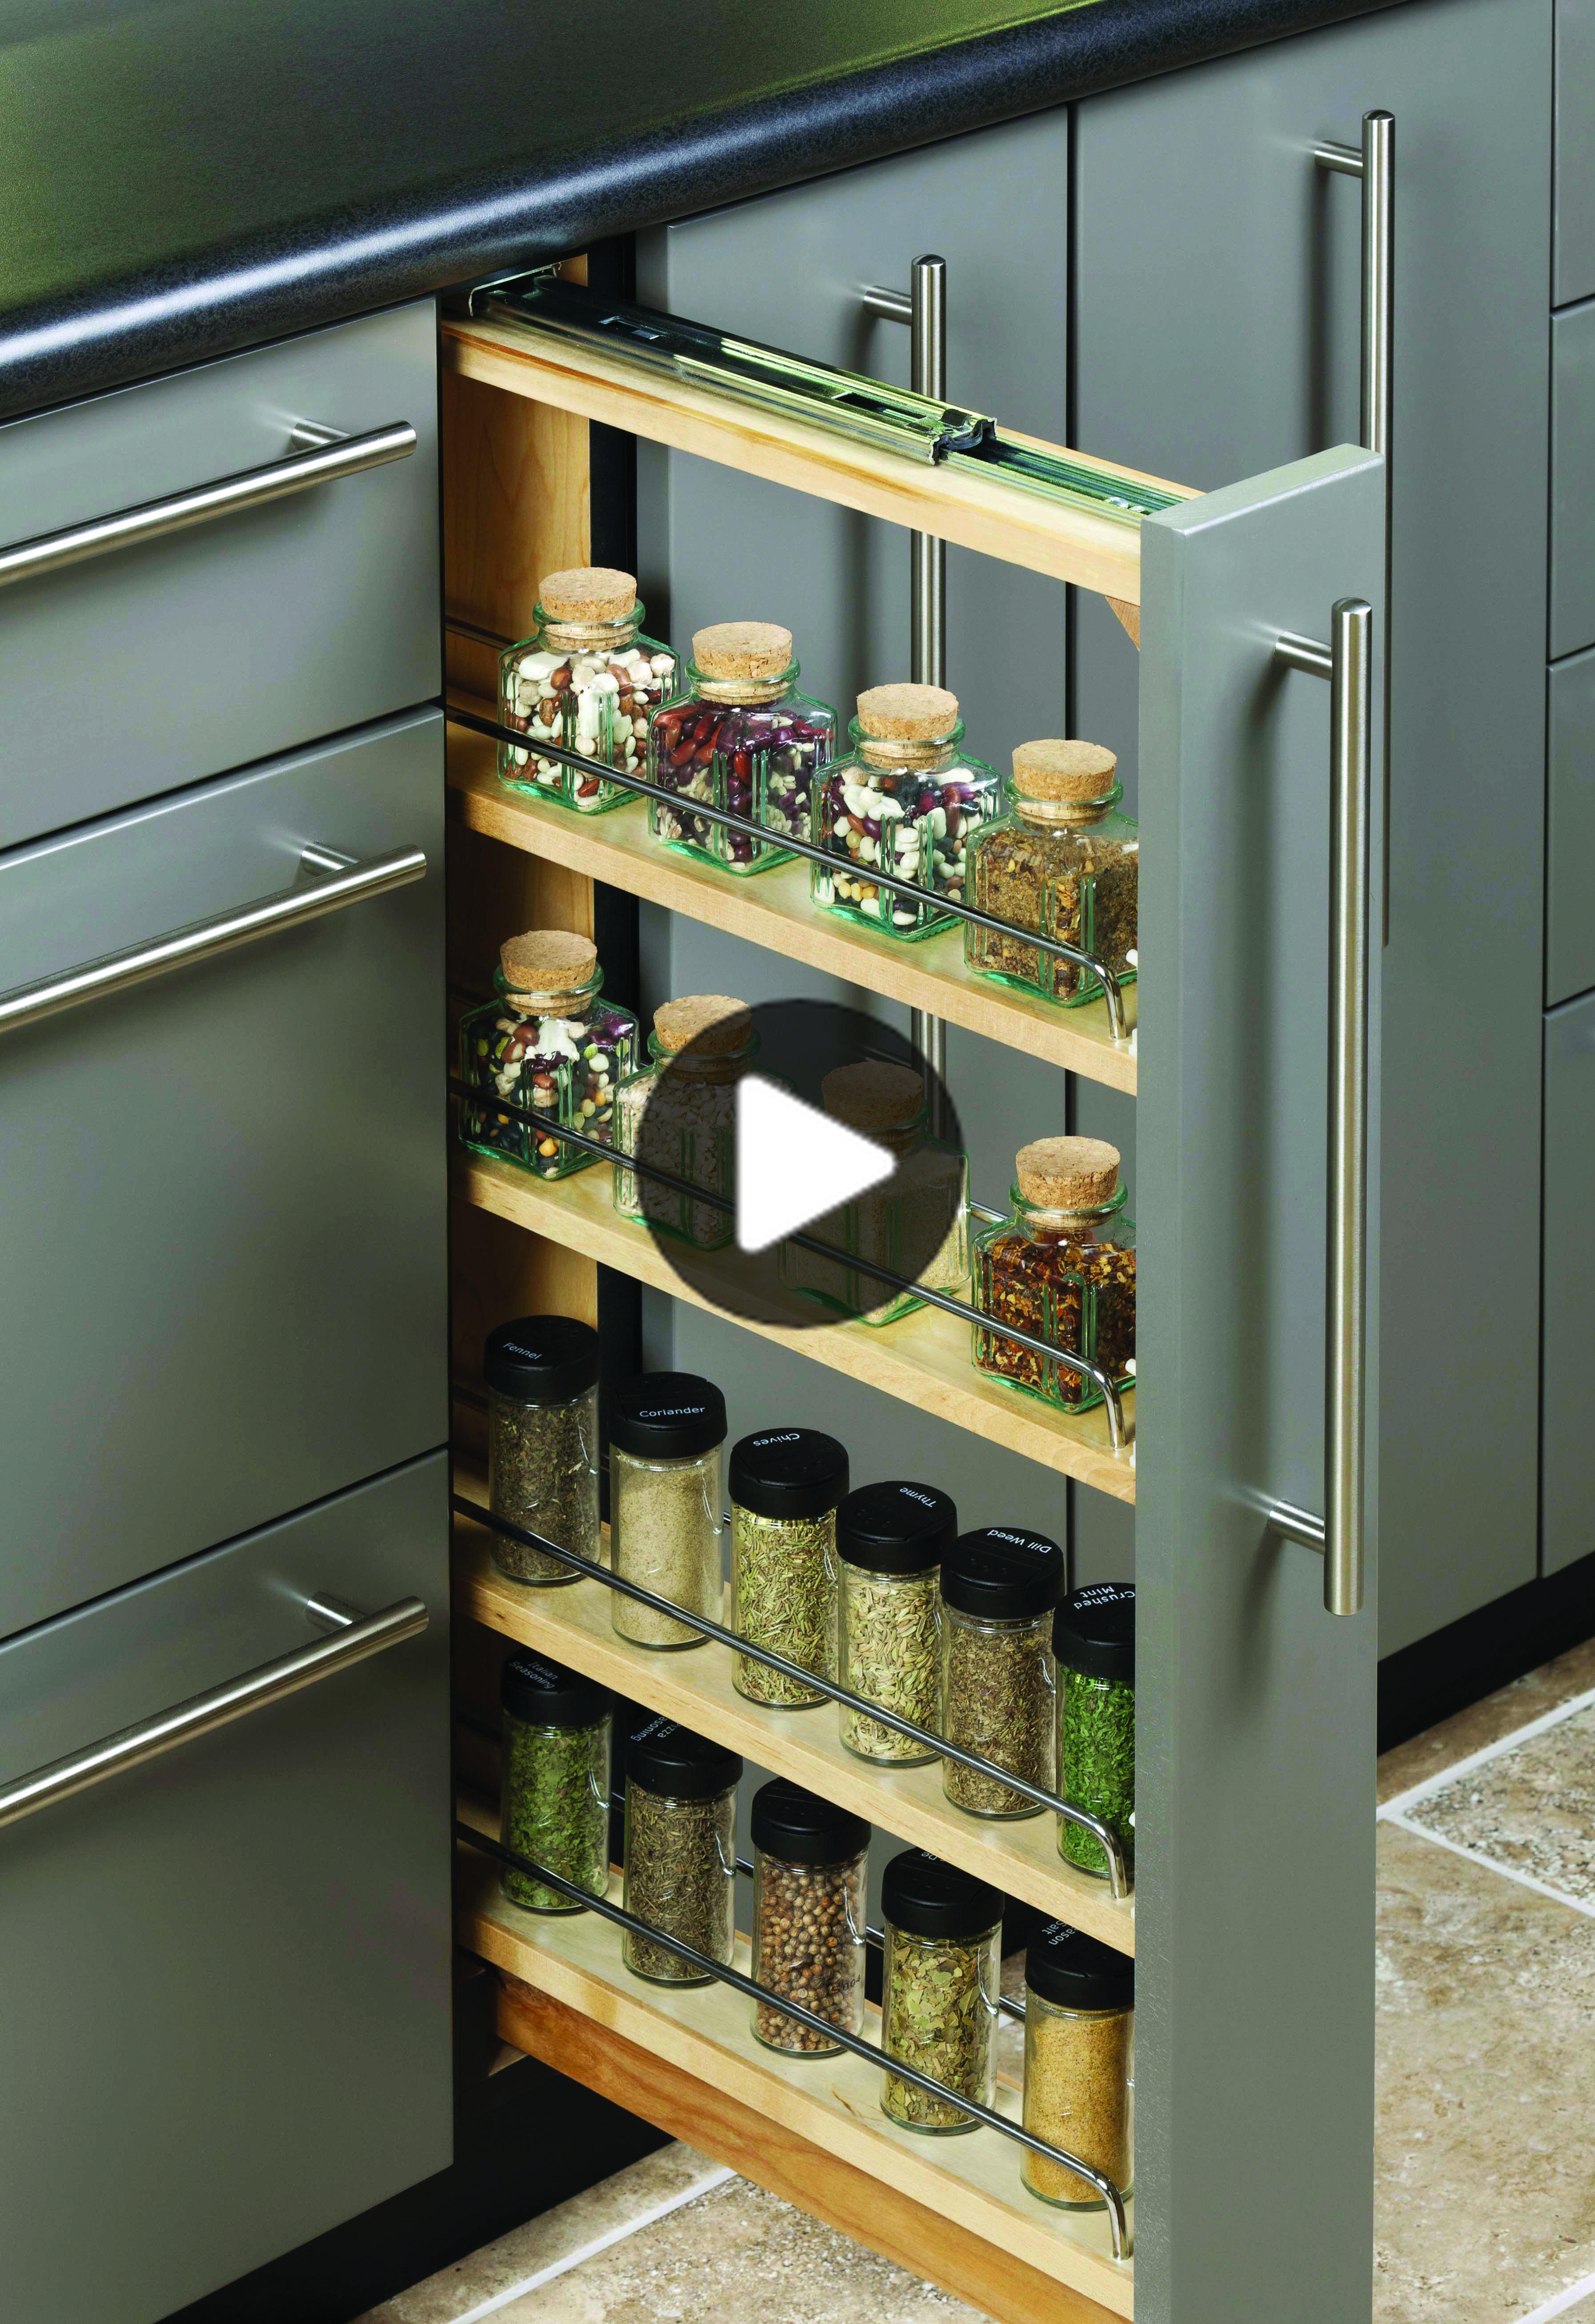 Houzzで最も人気のキッチンストレージのアイデア   Simple kitchen ...